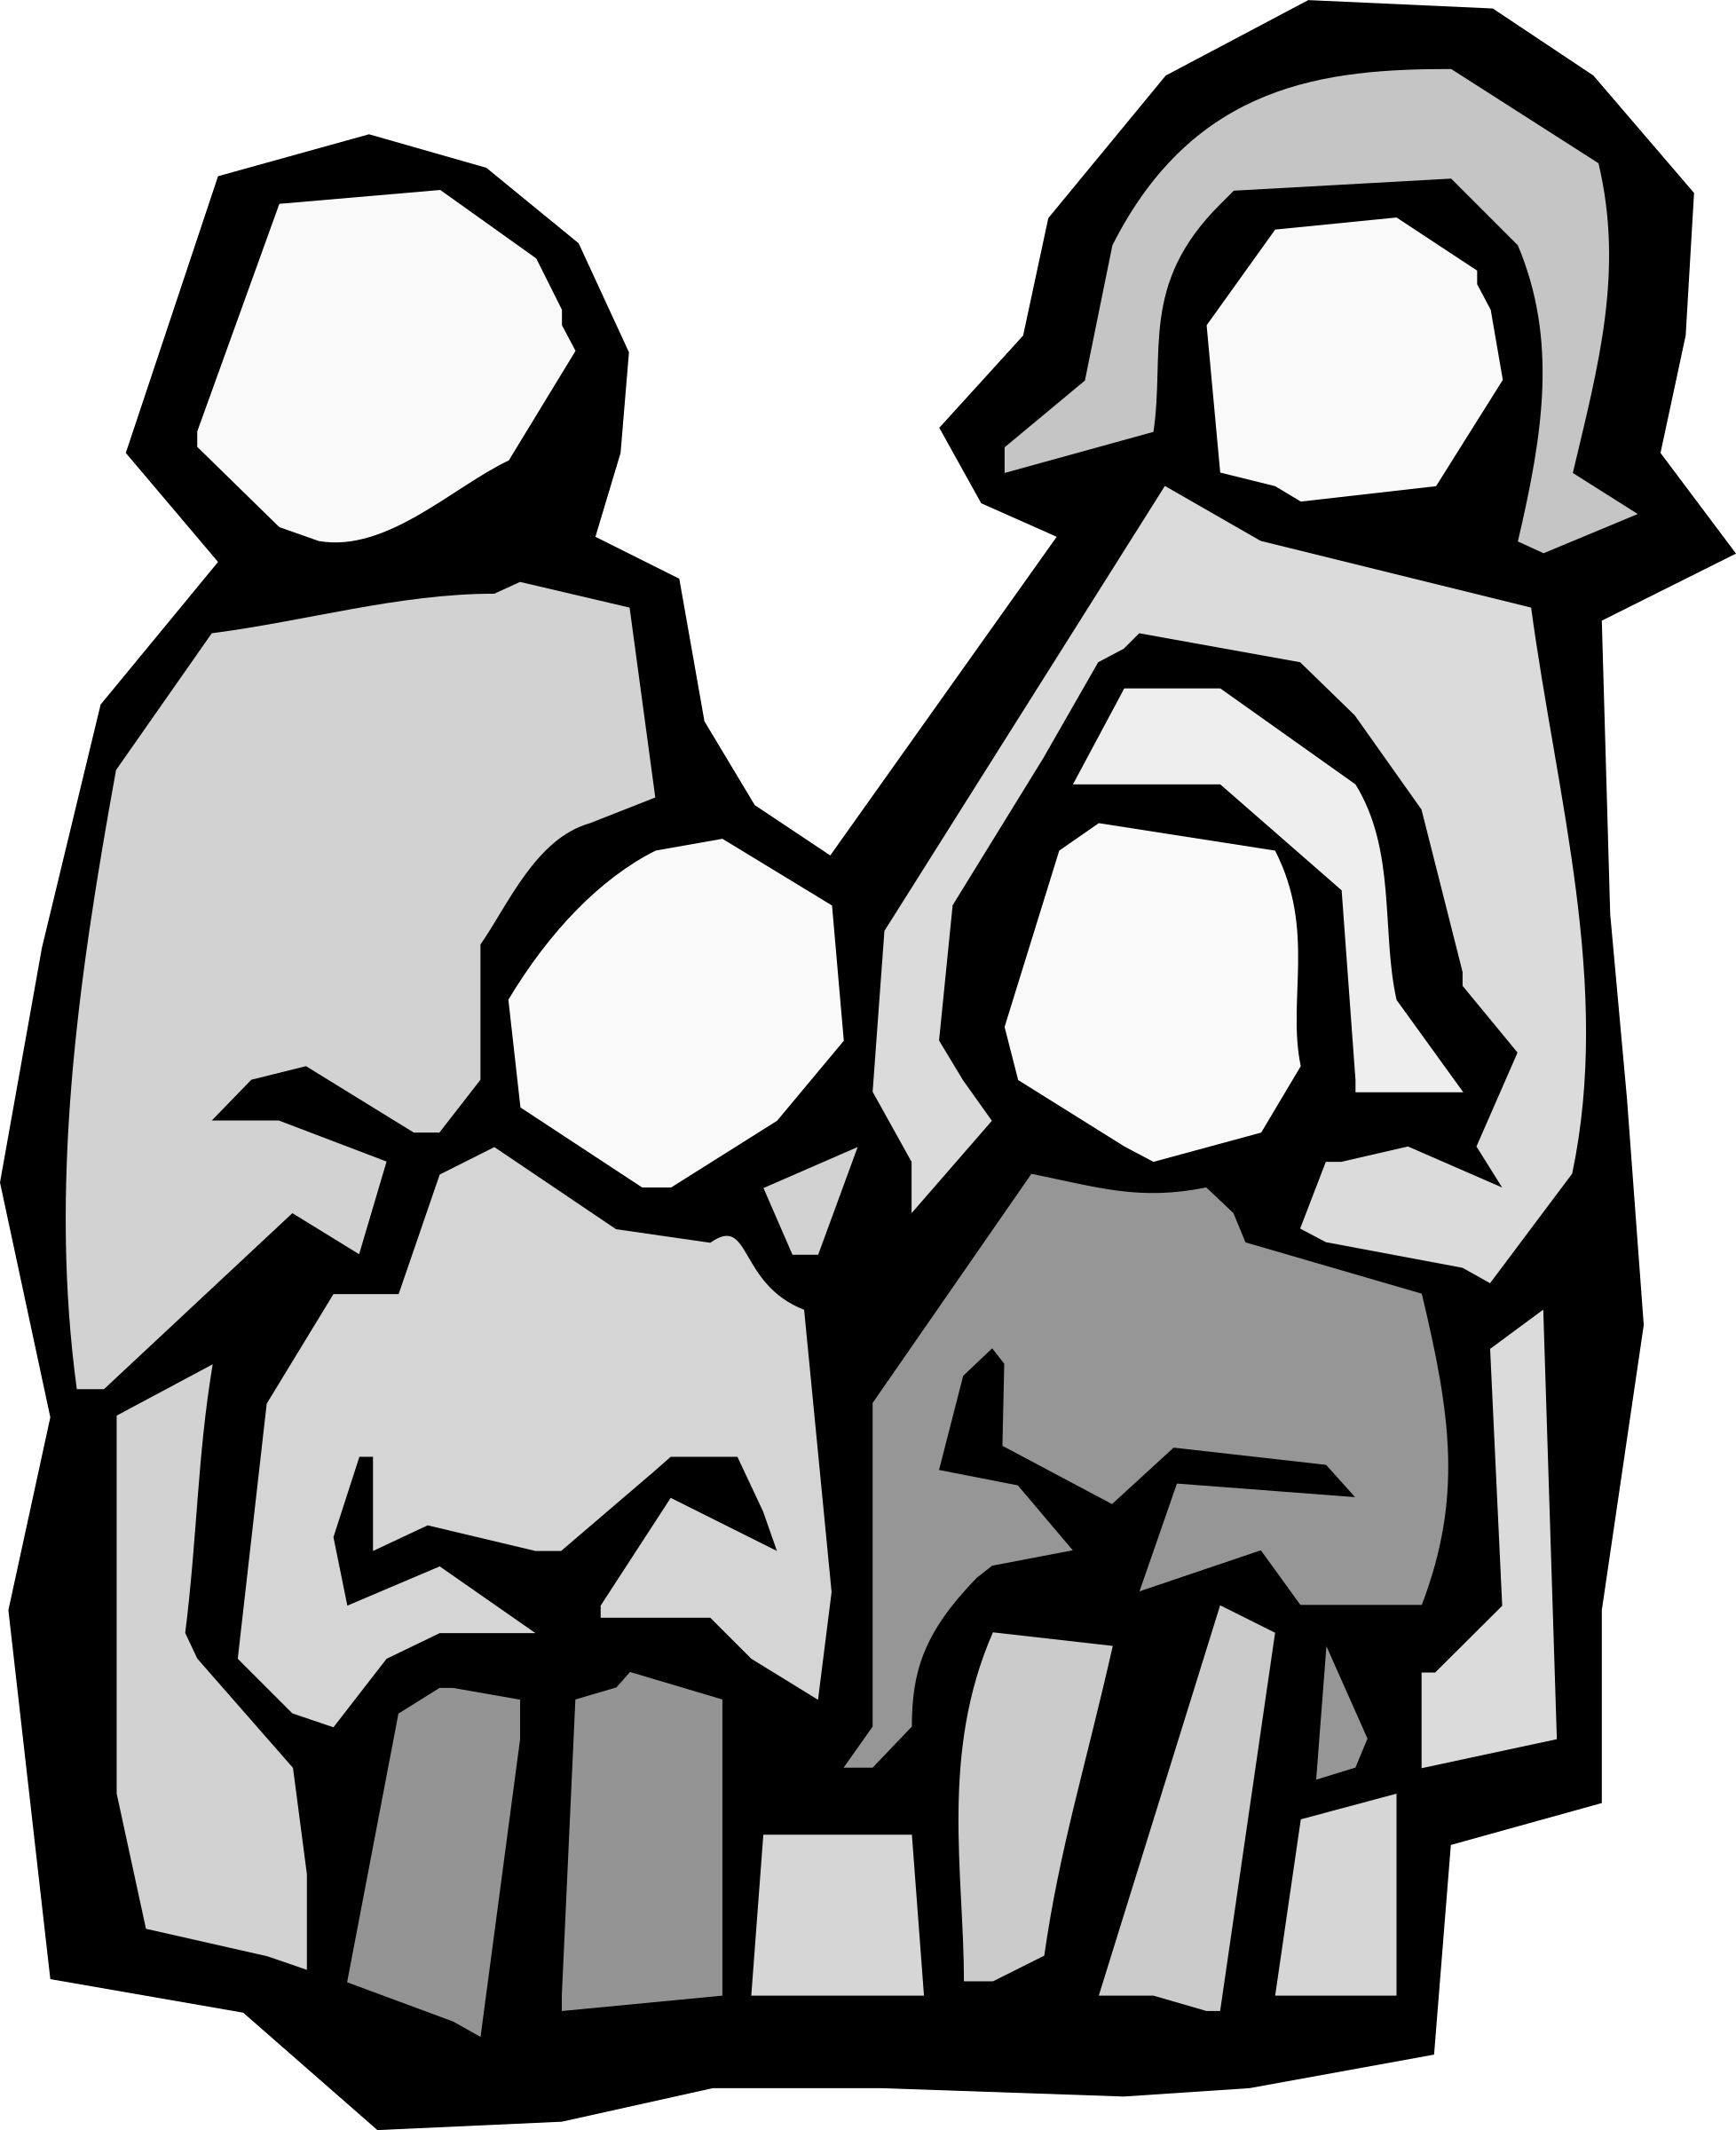 Sad clipart family, Sad family Transparent FREE for download.